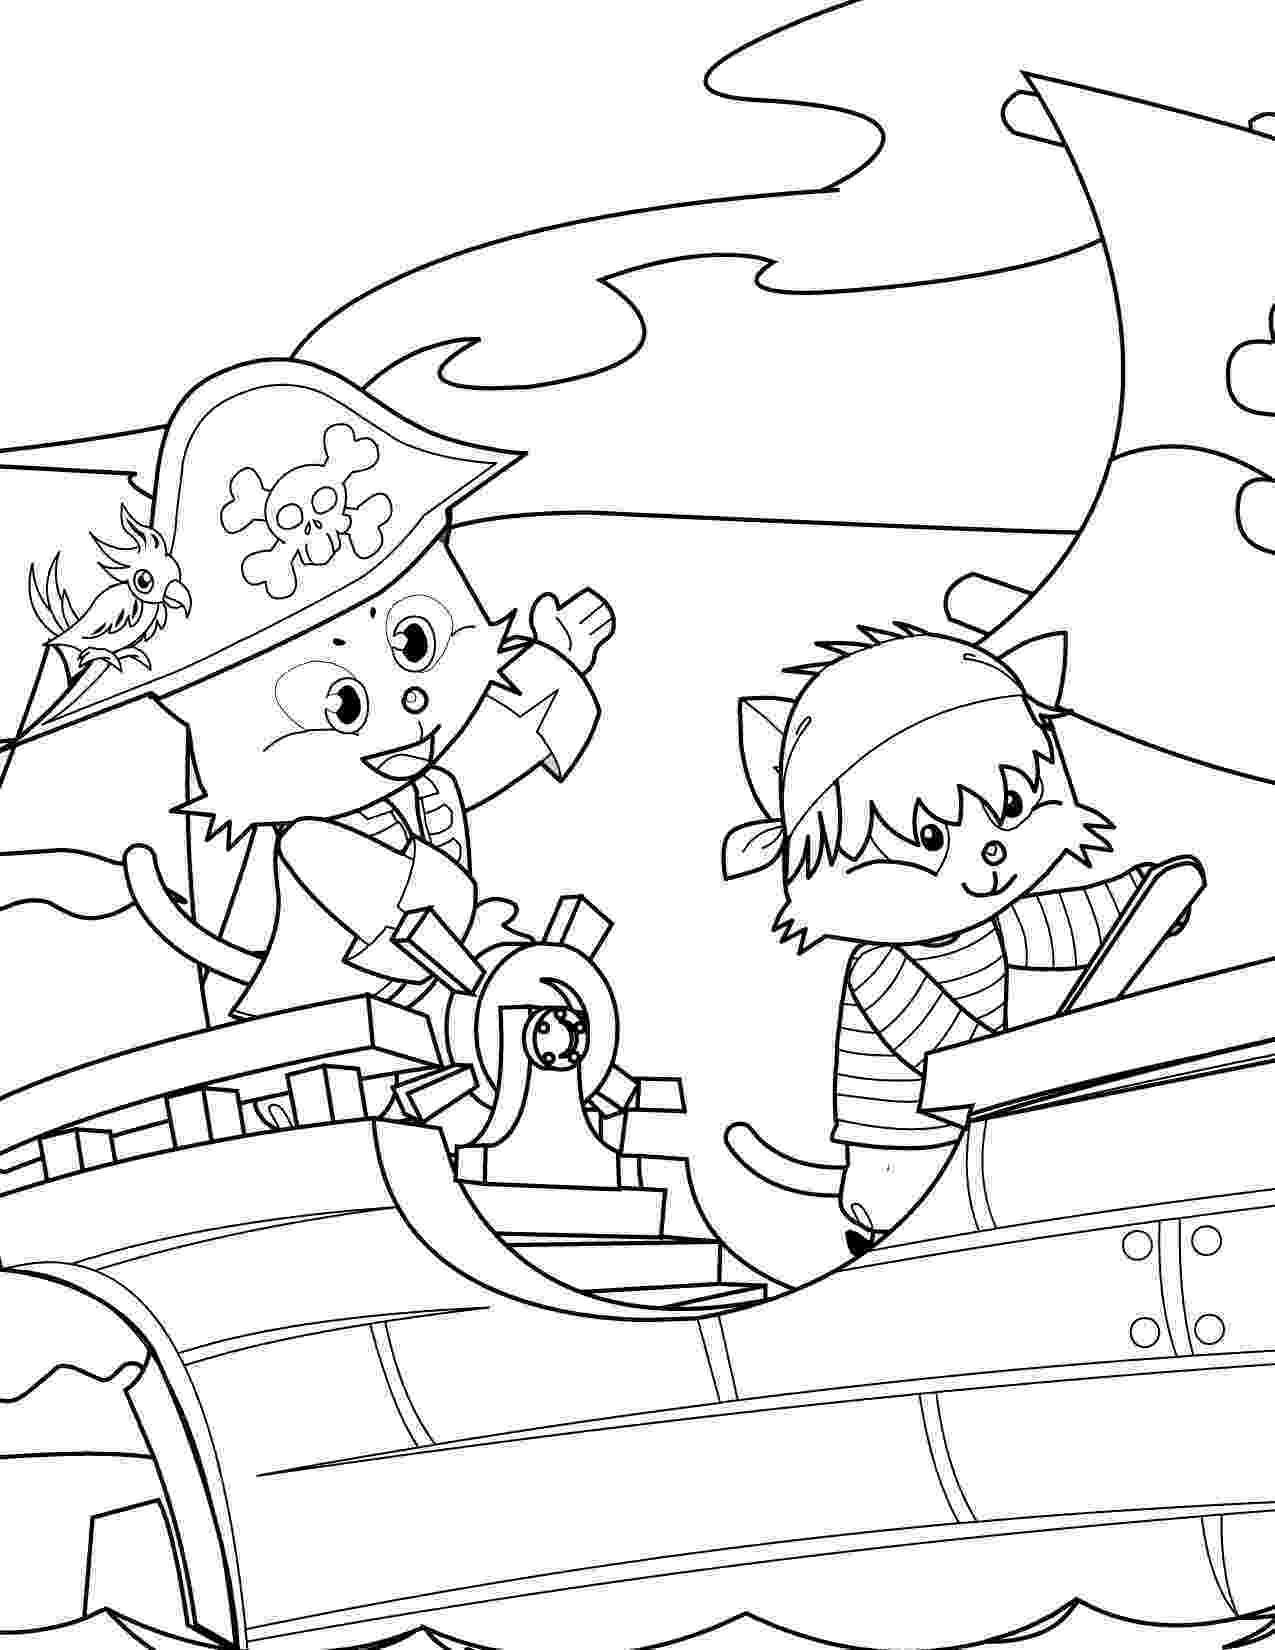 pirate coloring pirate coloring pages coloring pirate